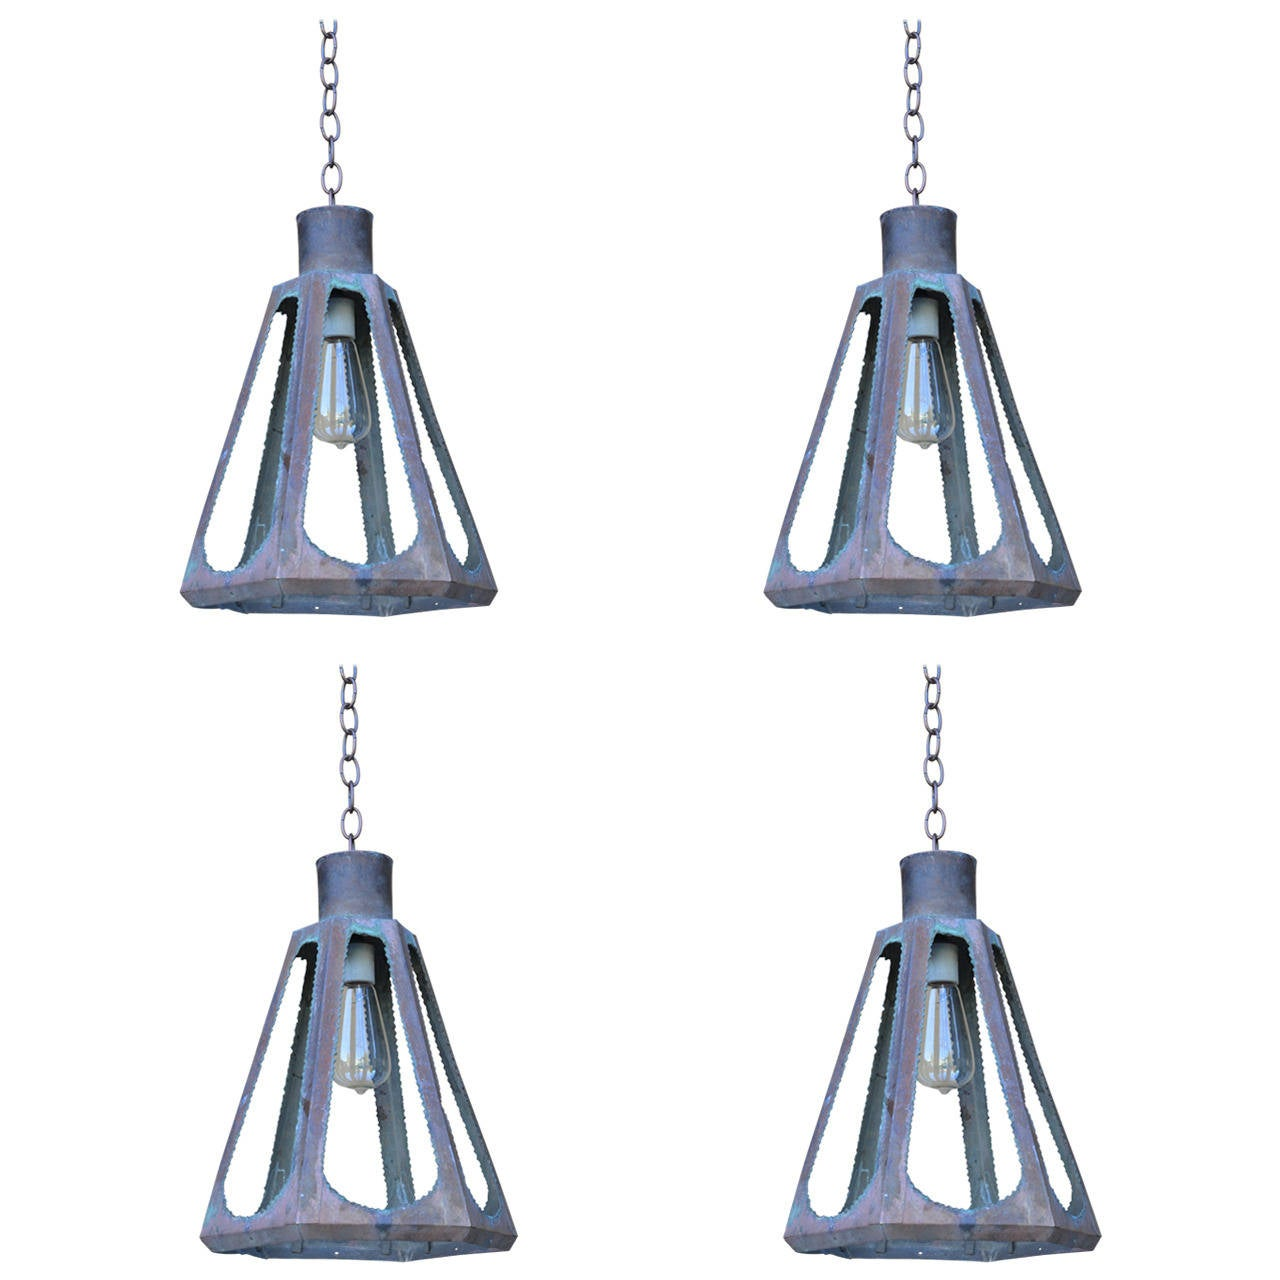 Set of Four Unusual Patinated Copper Brutalist Lanterns